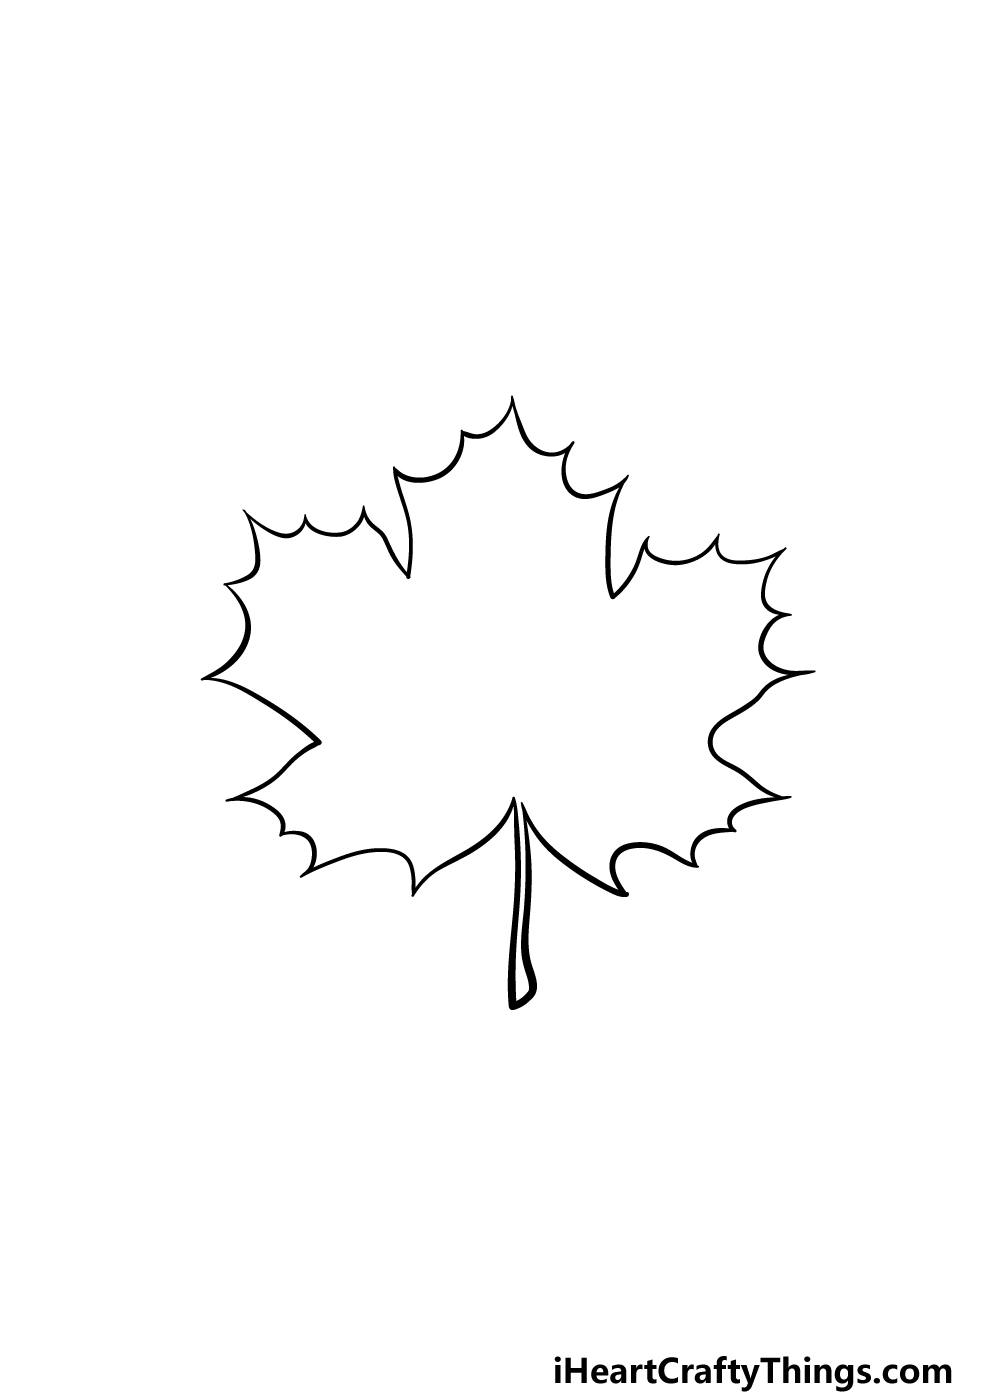 drawing a maple leaf step 4